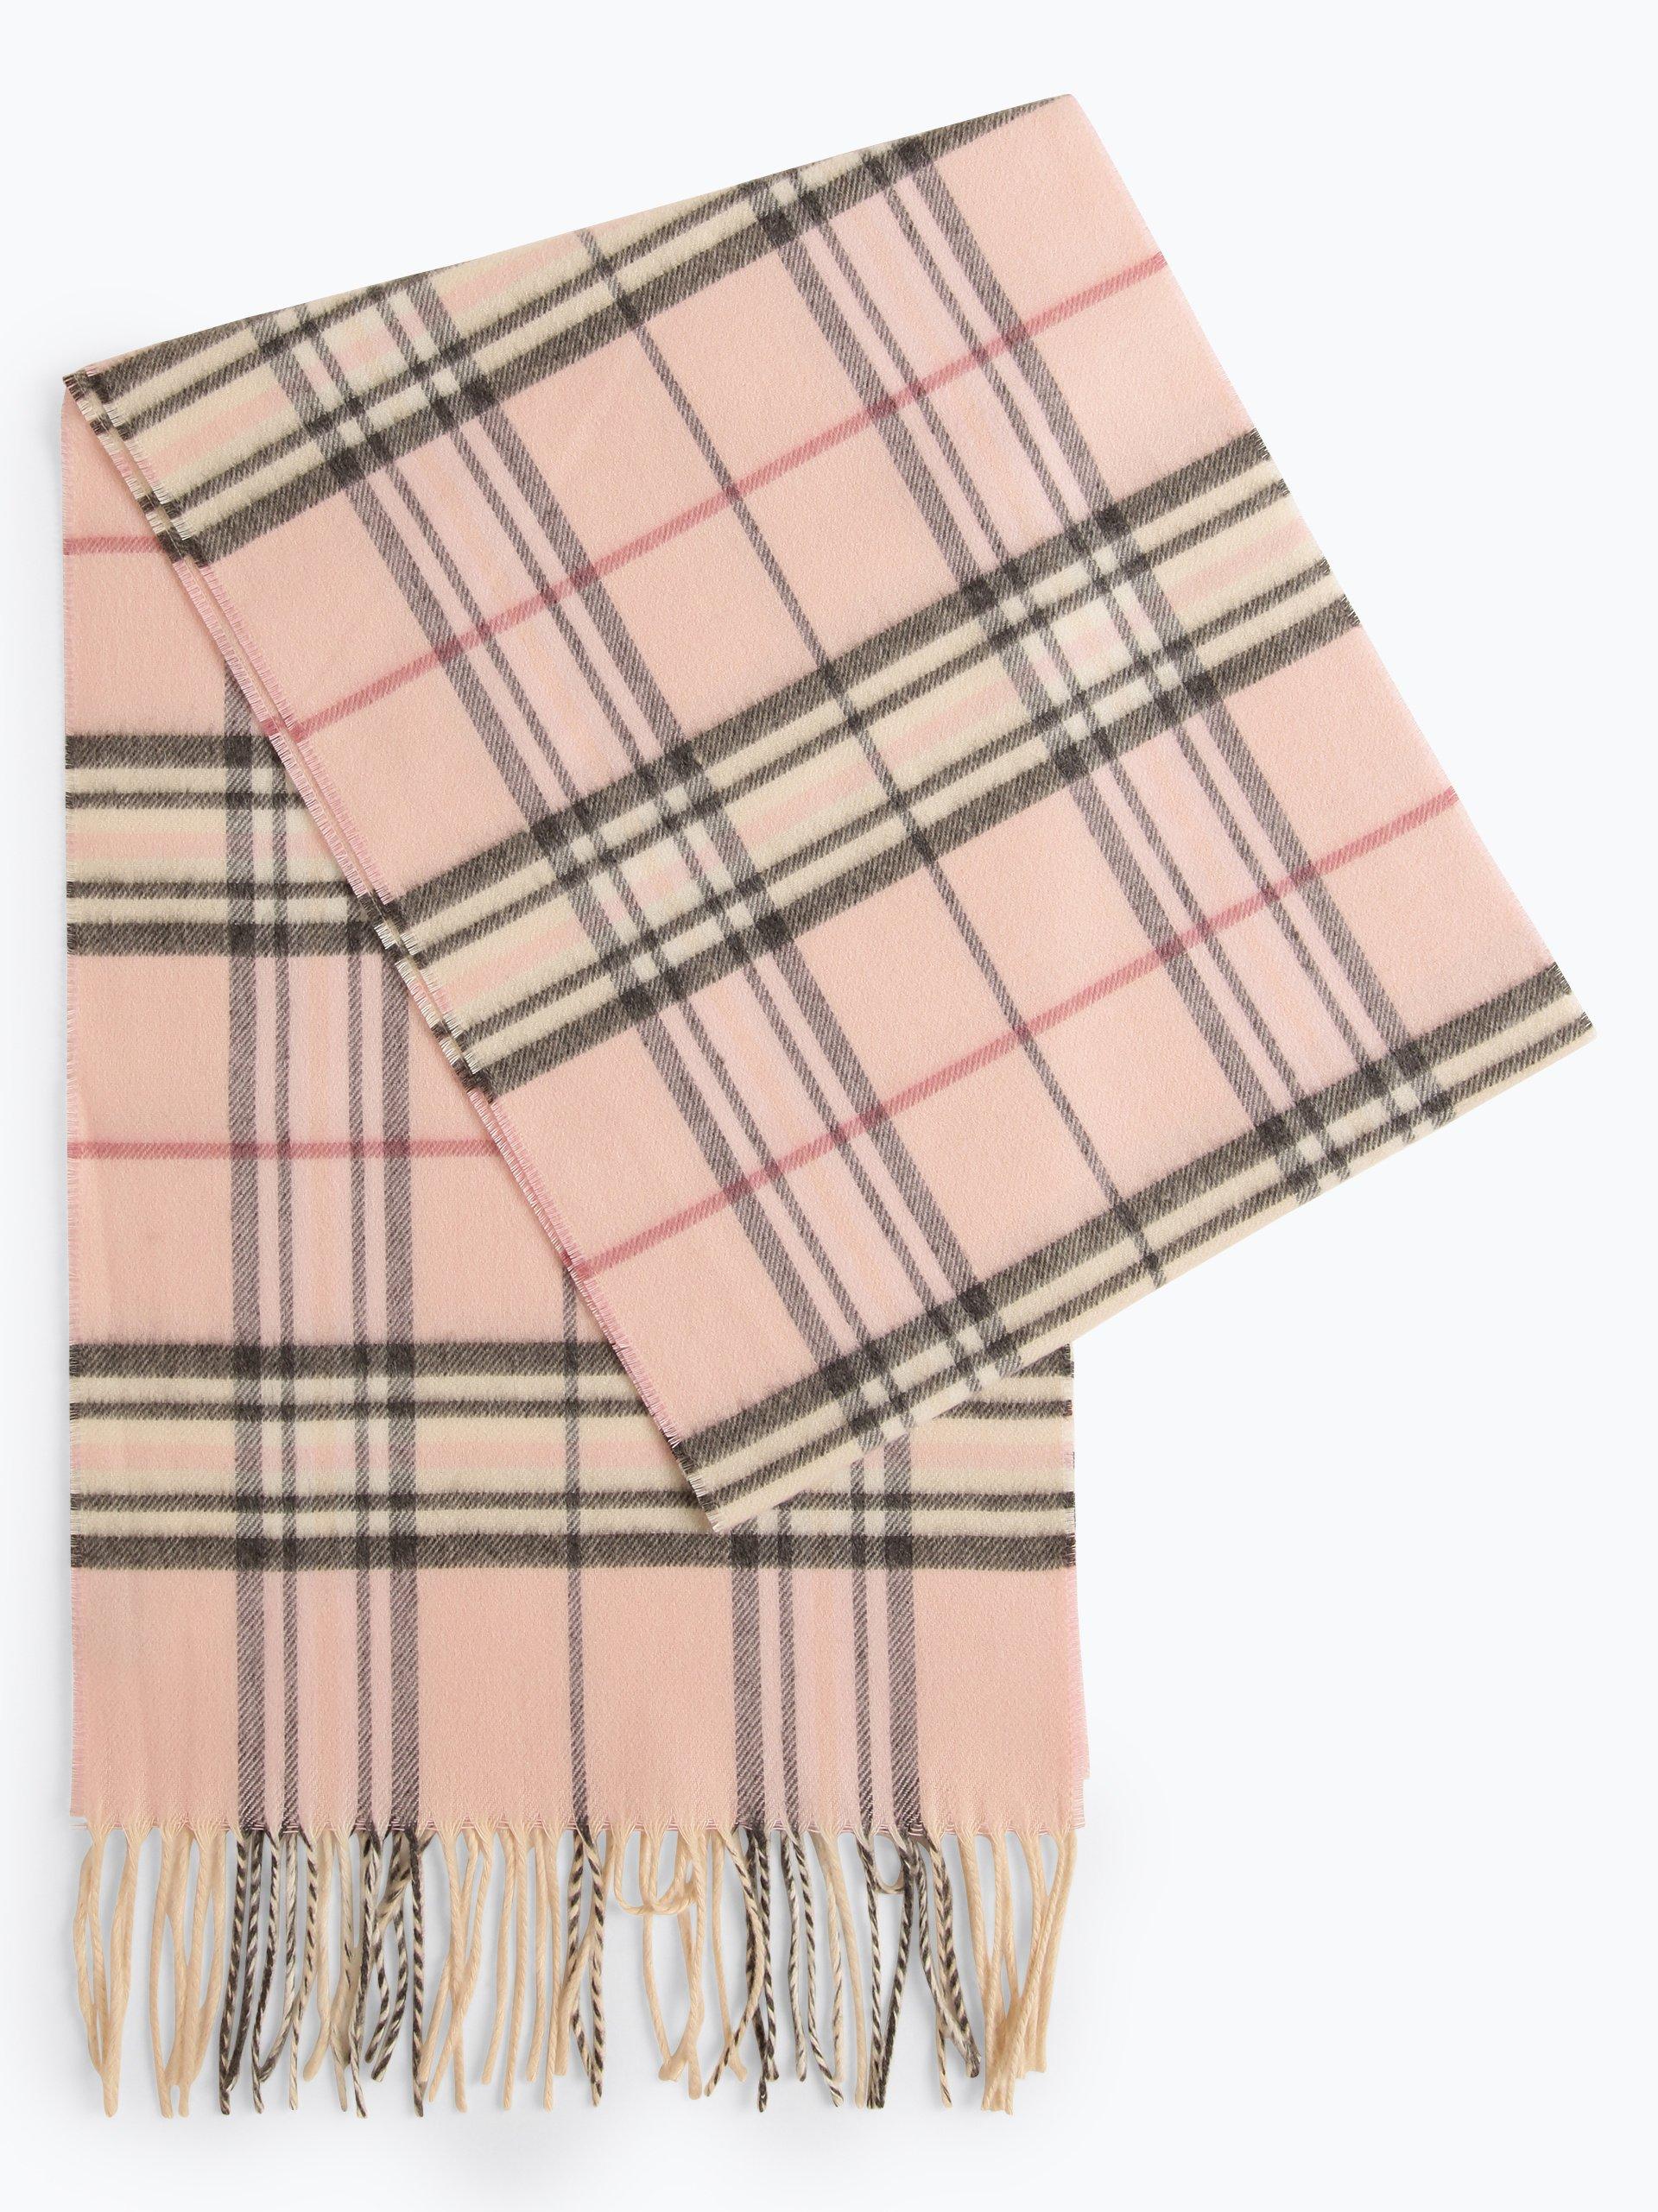 Franco Callegari Damen Schal